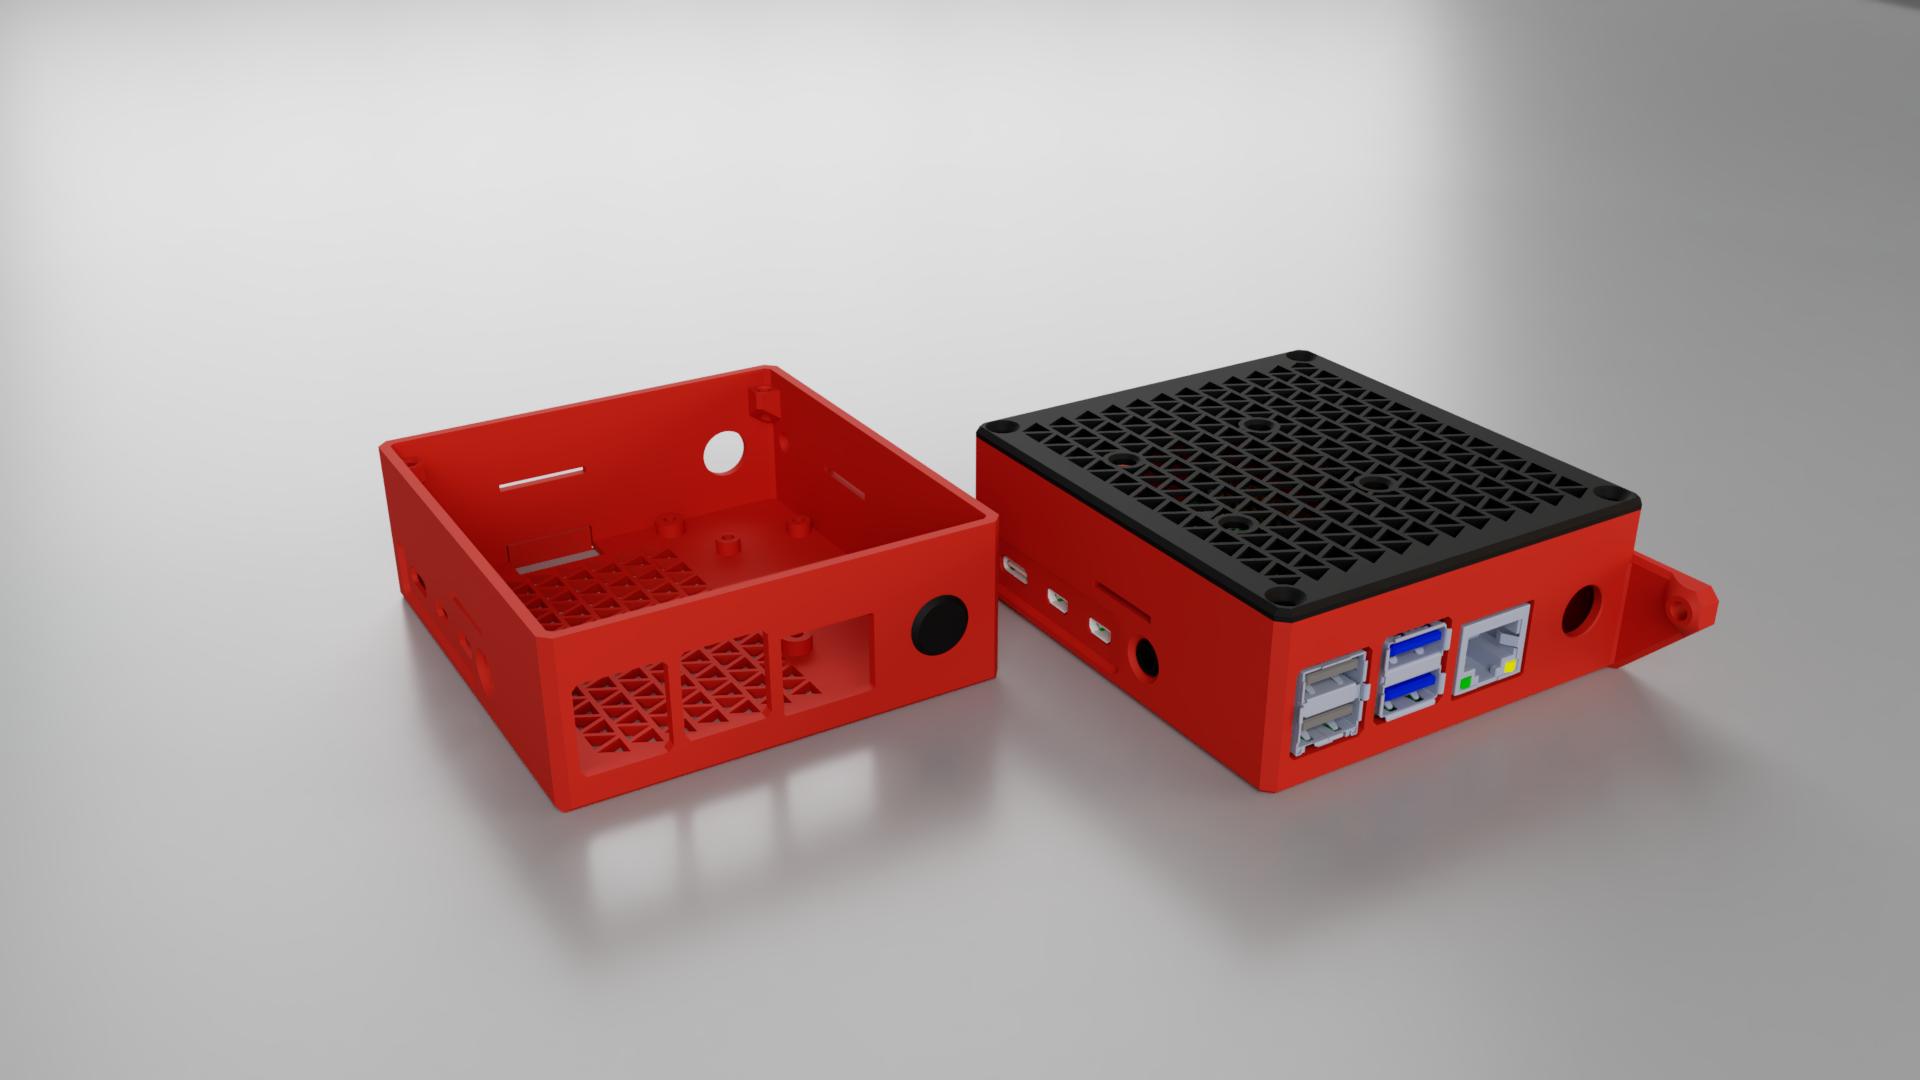 Raspberry Pi 4 Case for Pi & Buck Converter - 40mm fan - Direct Prusa i3 MK3 attachment / Wall mount